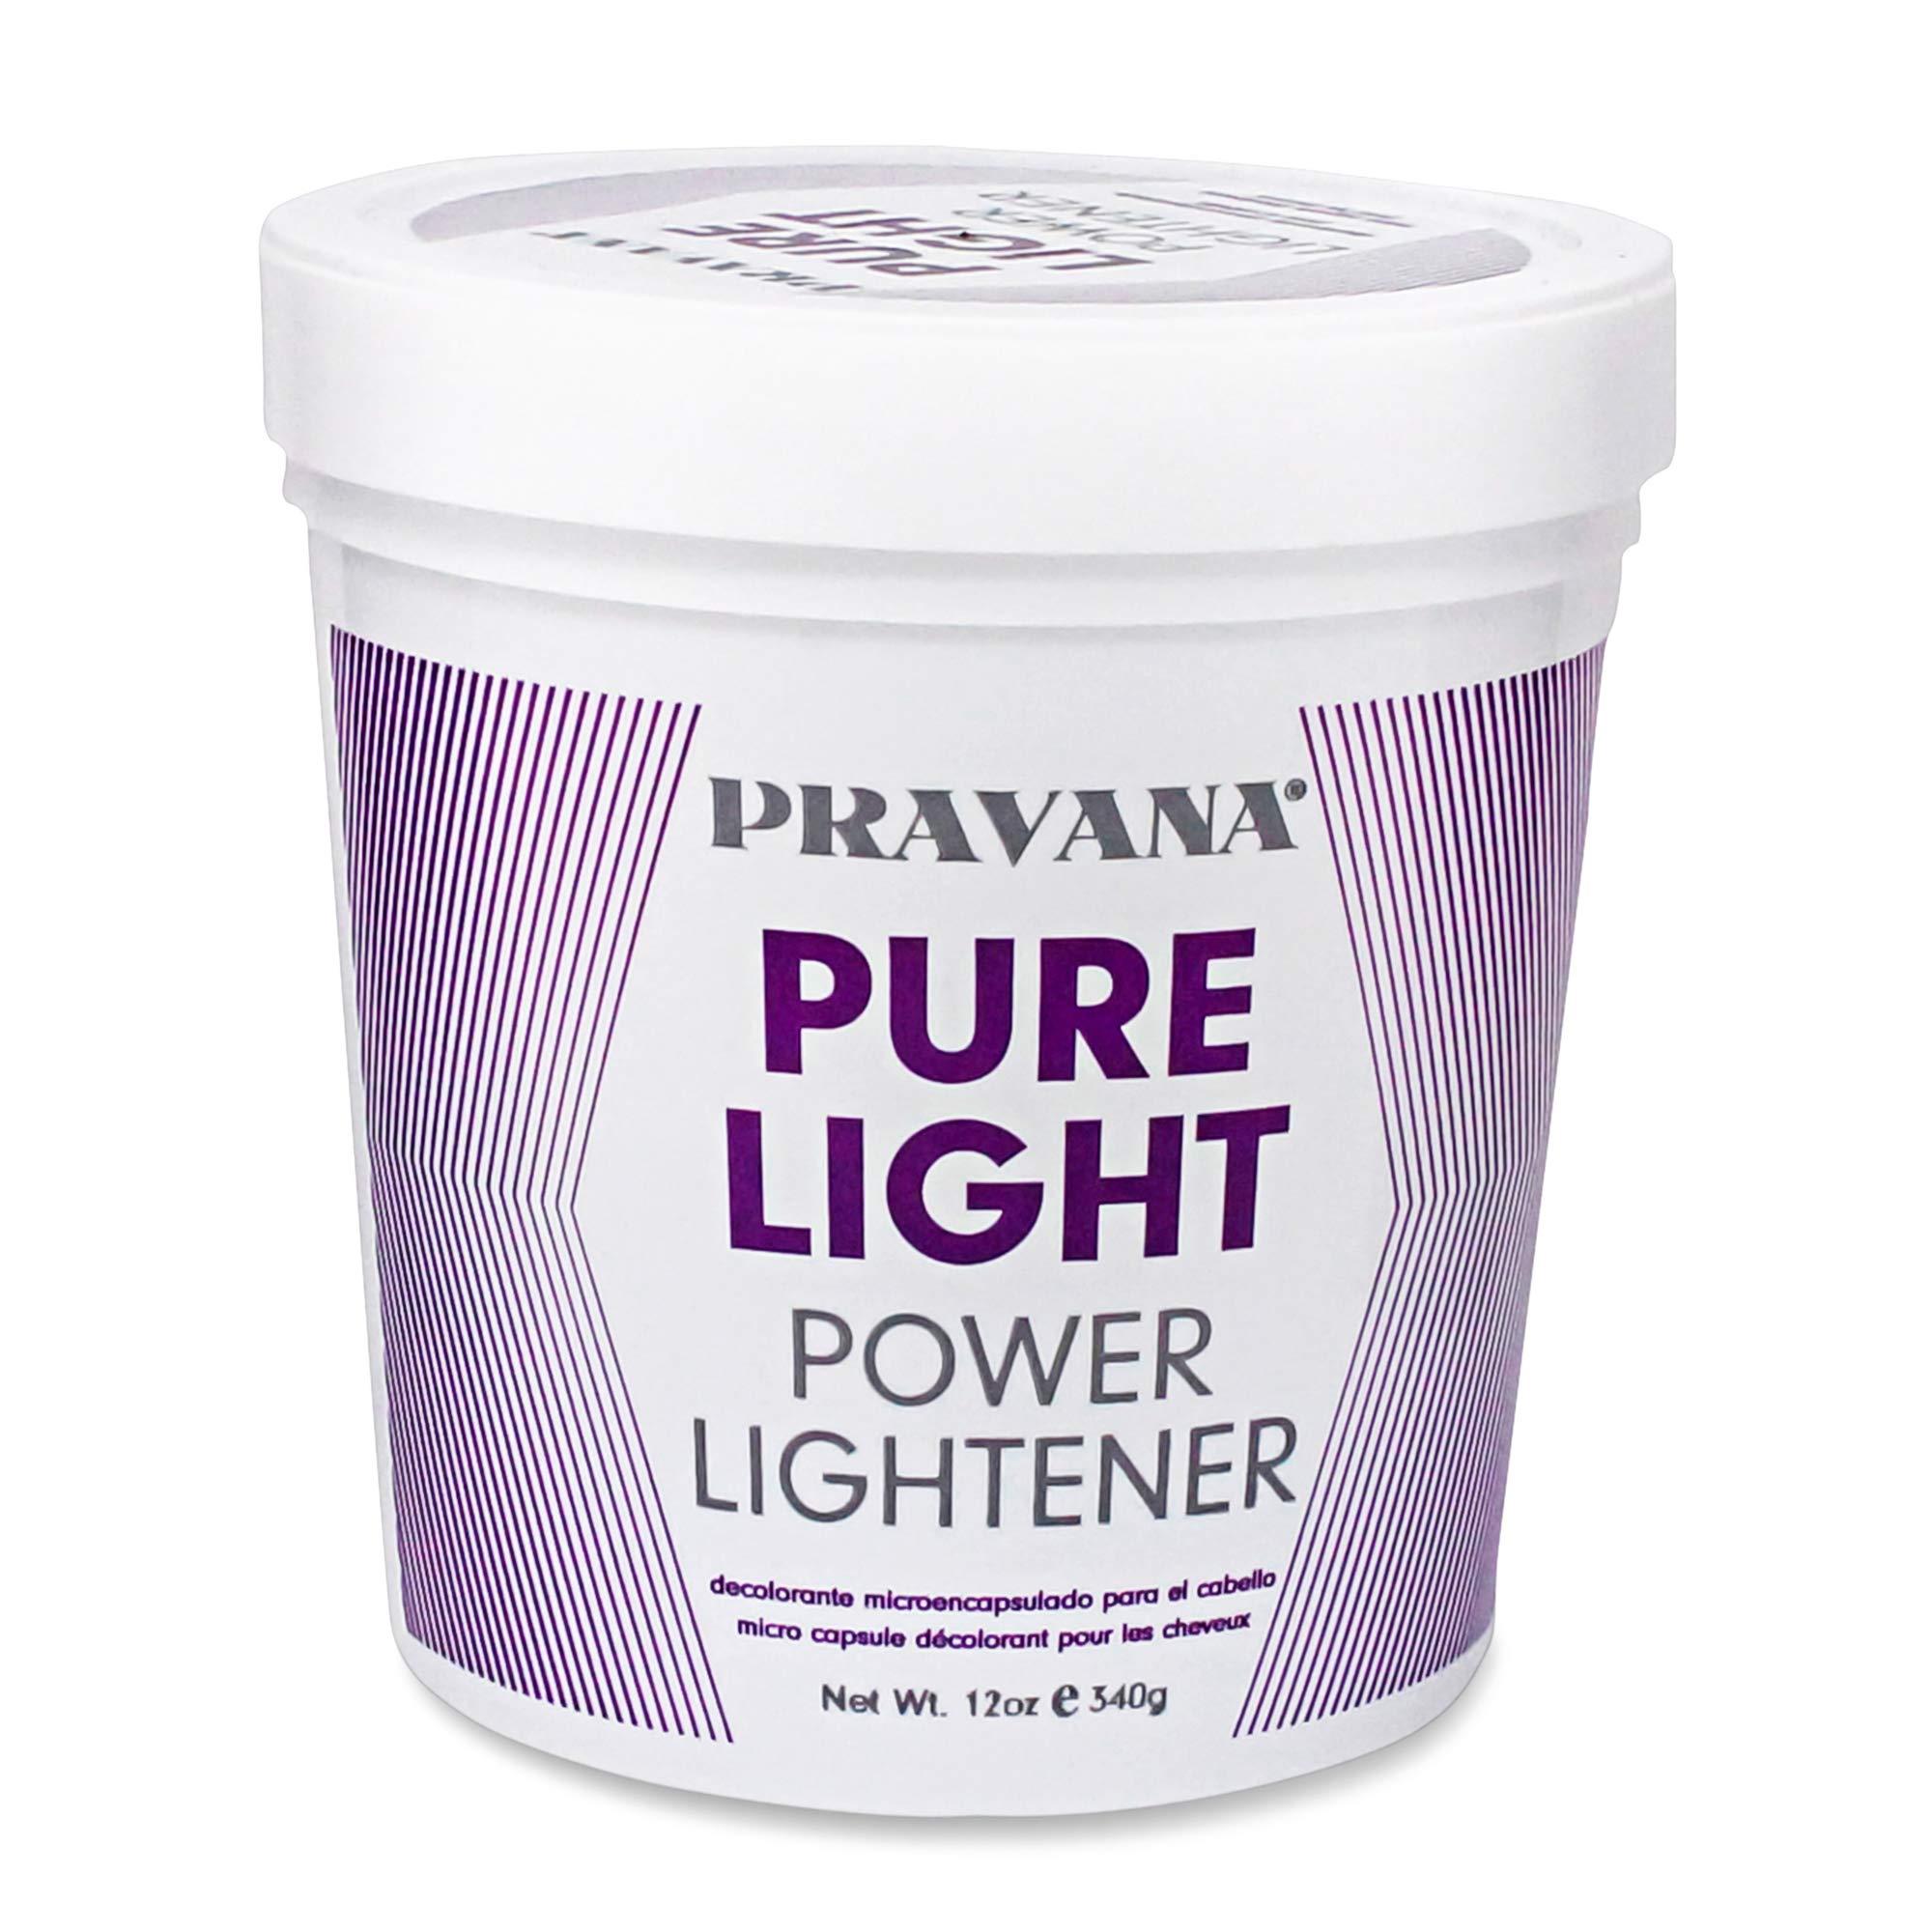 Pravana Pure Light Power Lightener 12 oz by Pravana